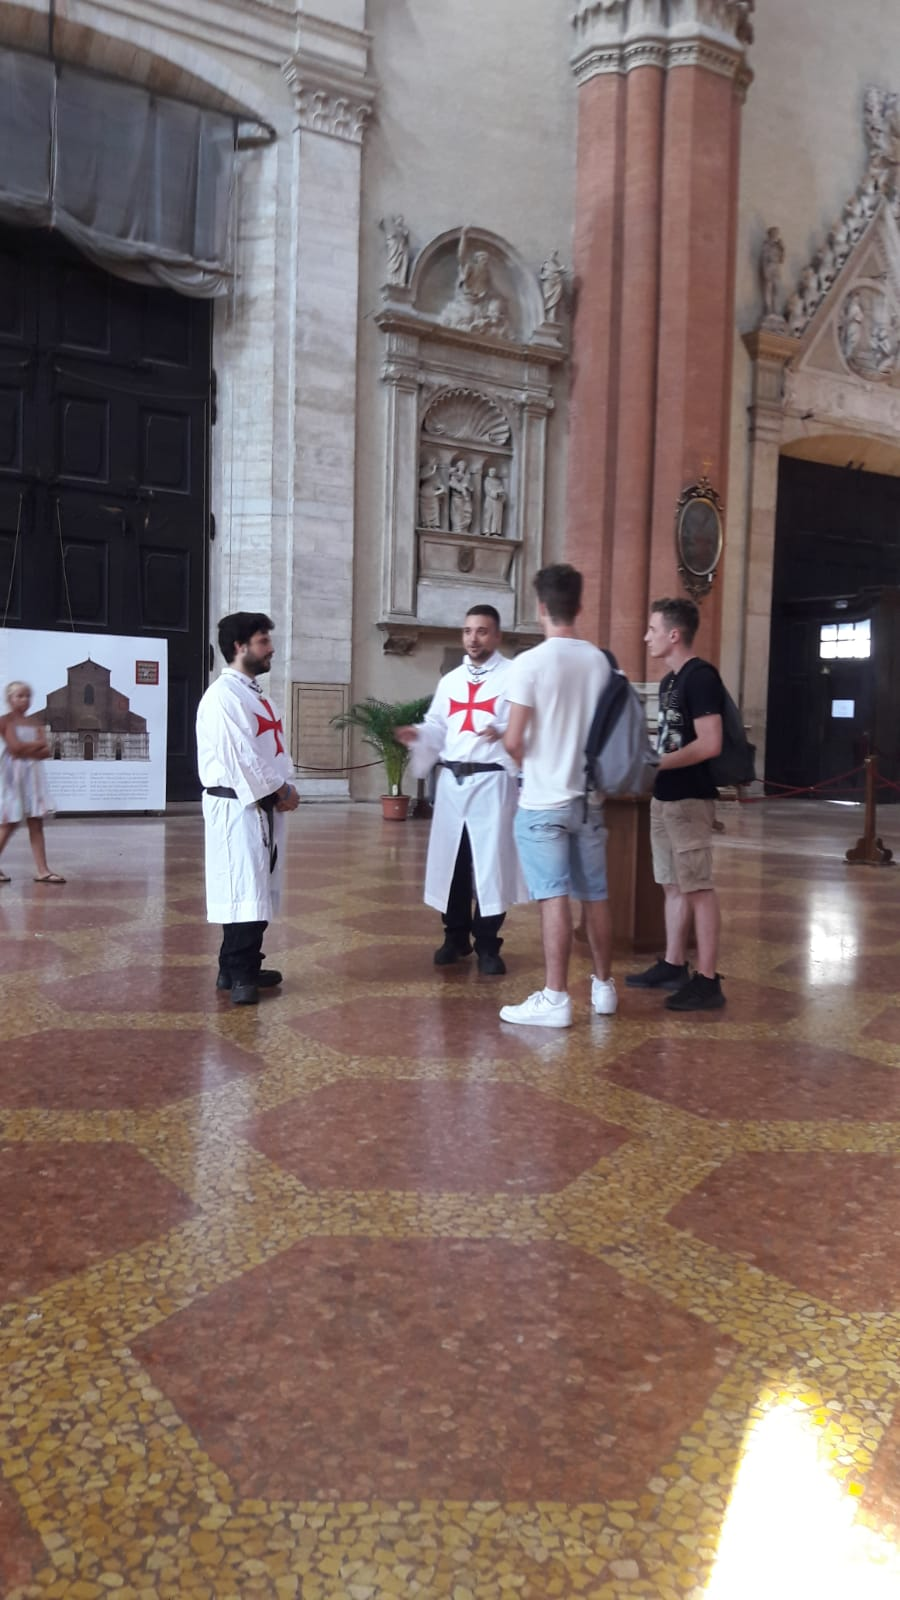 Custodia Basilica di San Petronio – Bologna 3-4 ago 2019